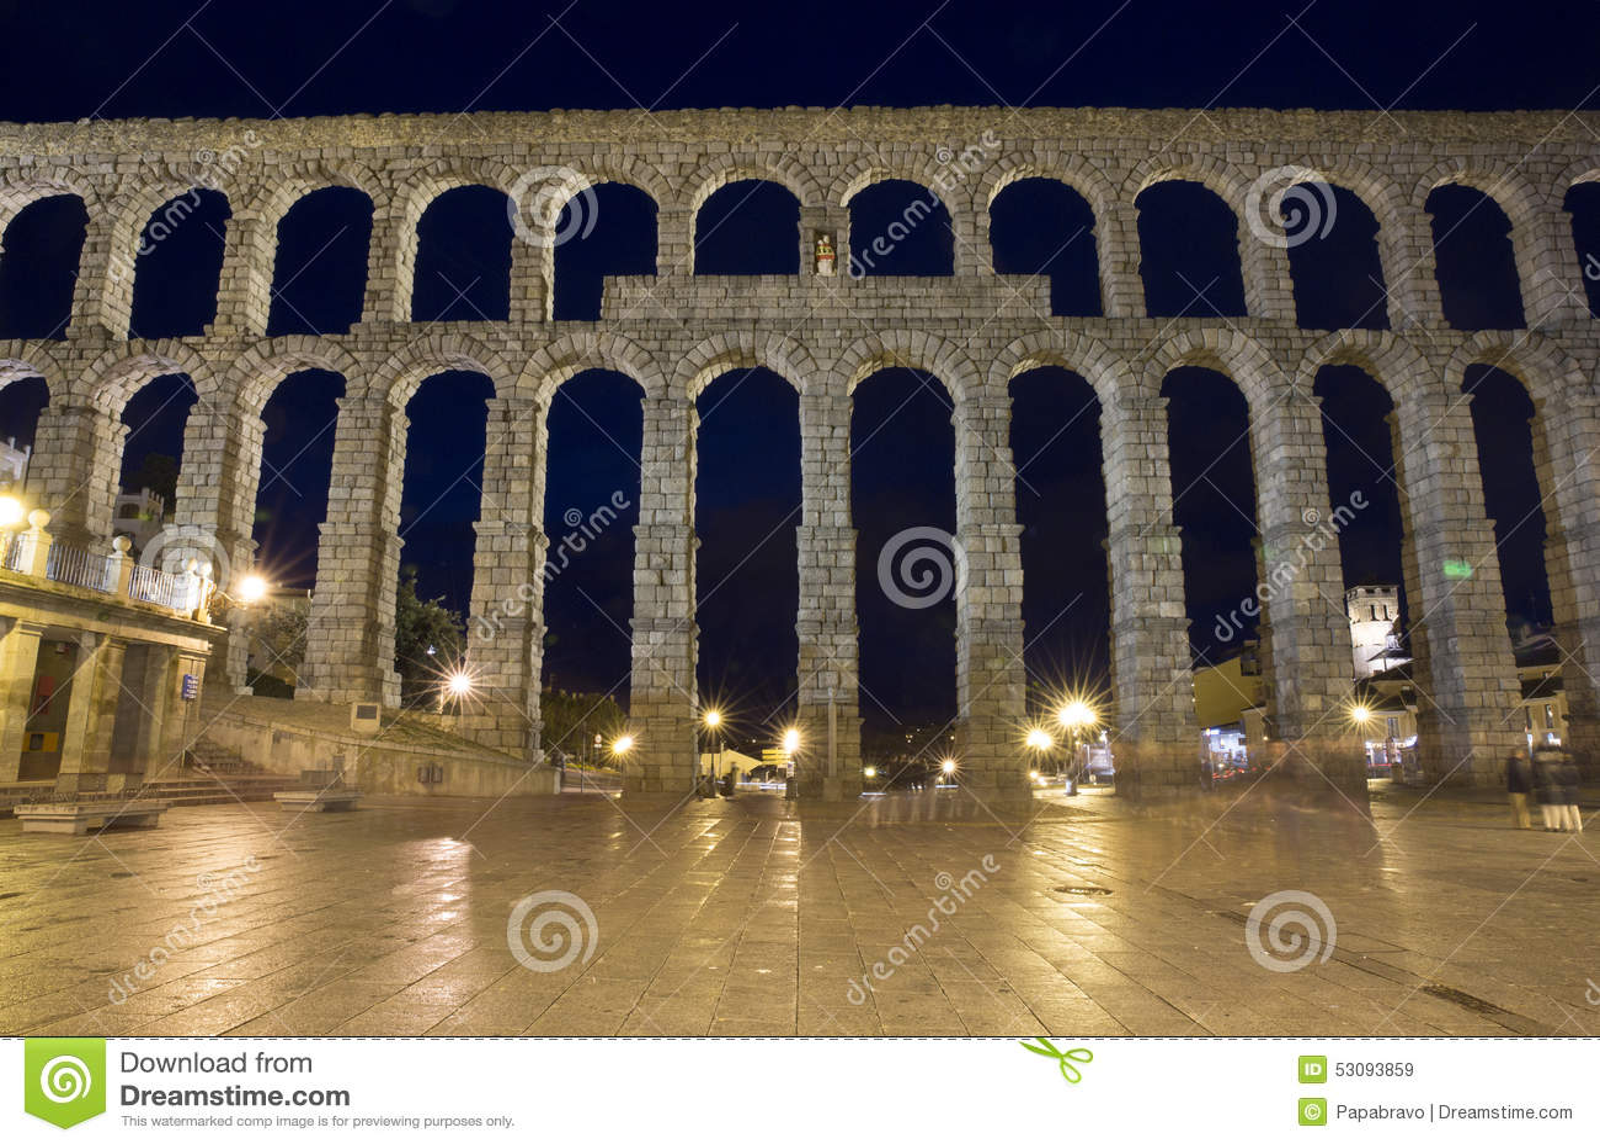 View of main square and roman aqueduct Segovia Spain